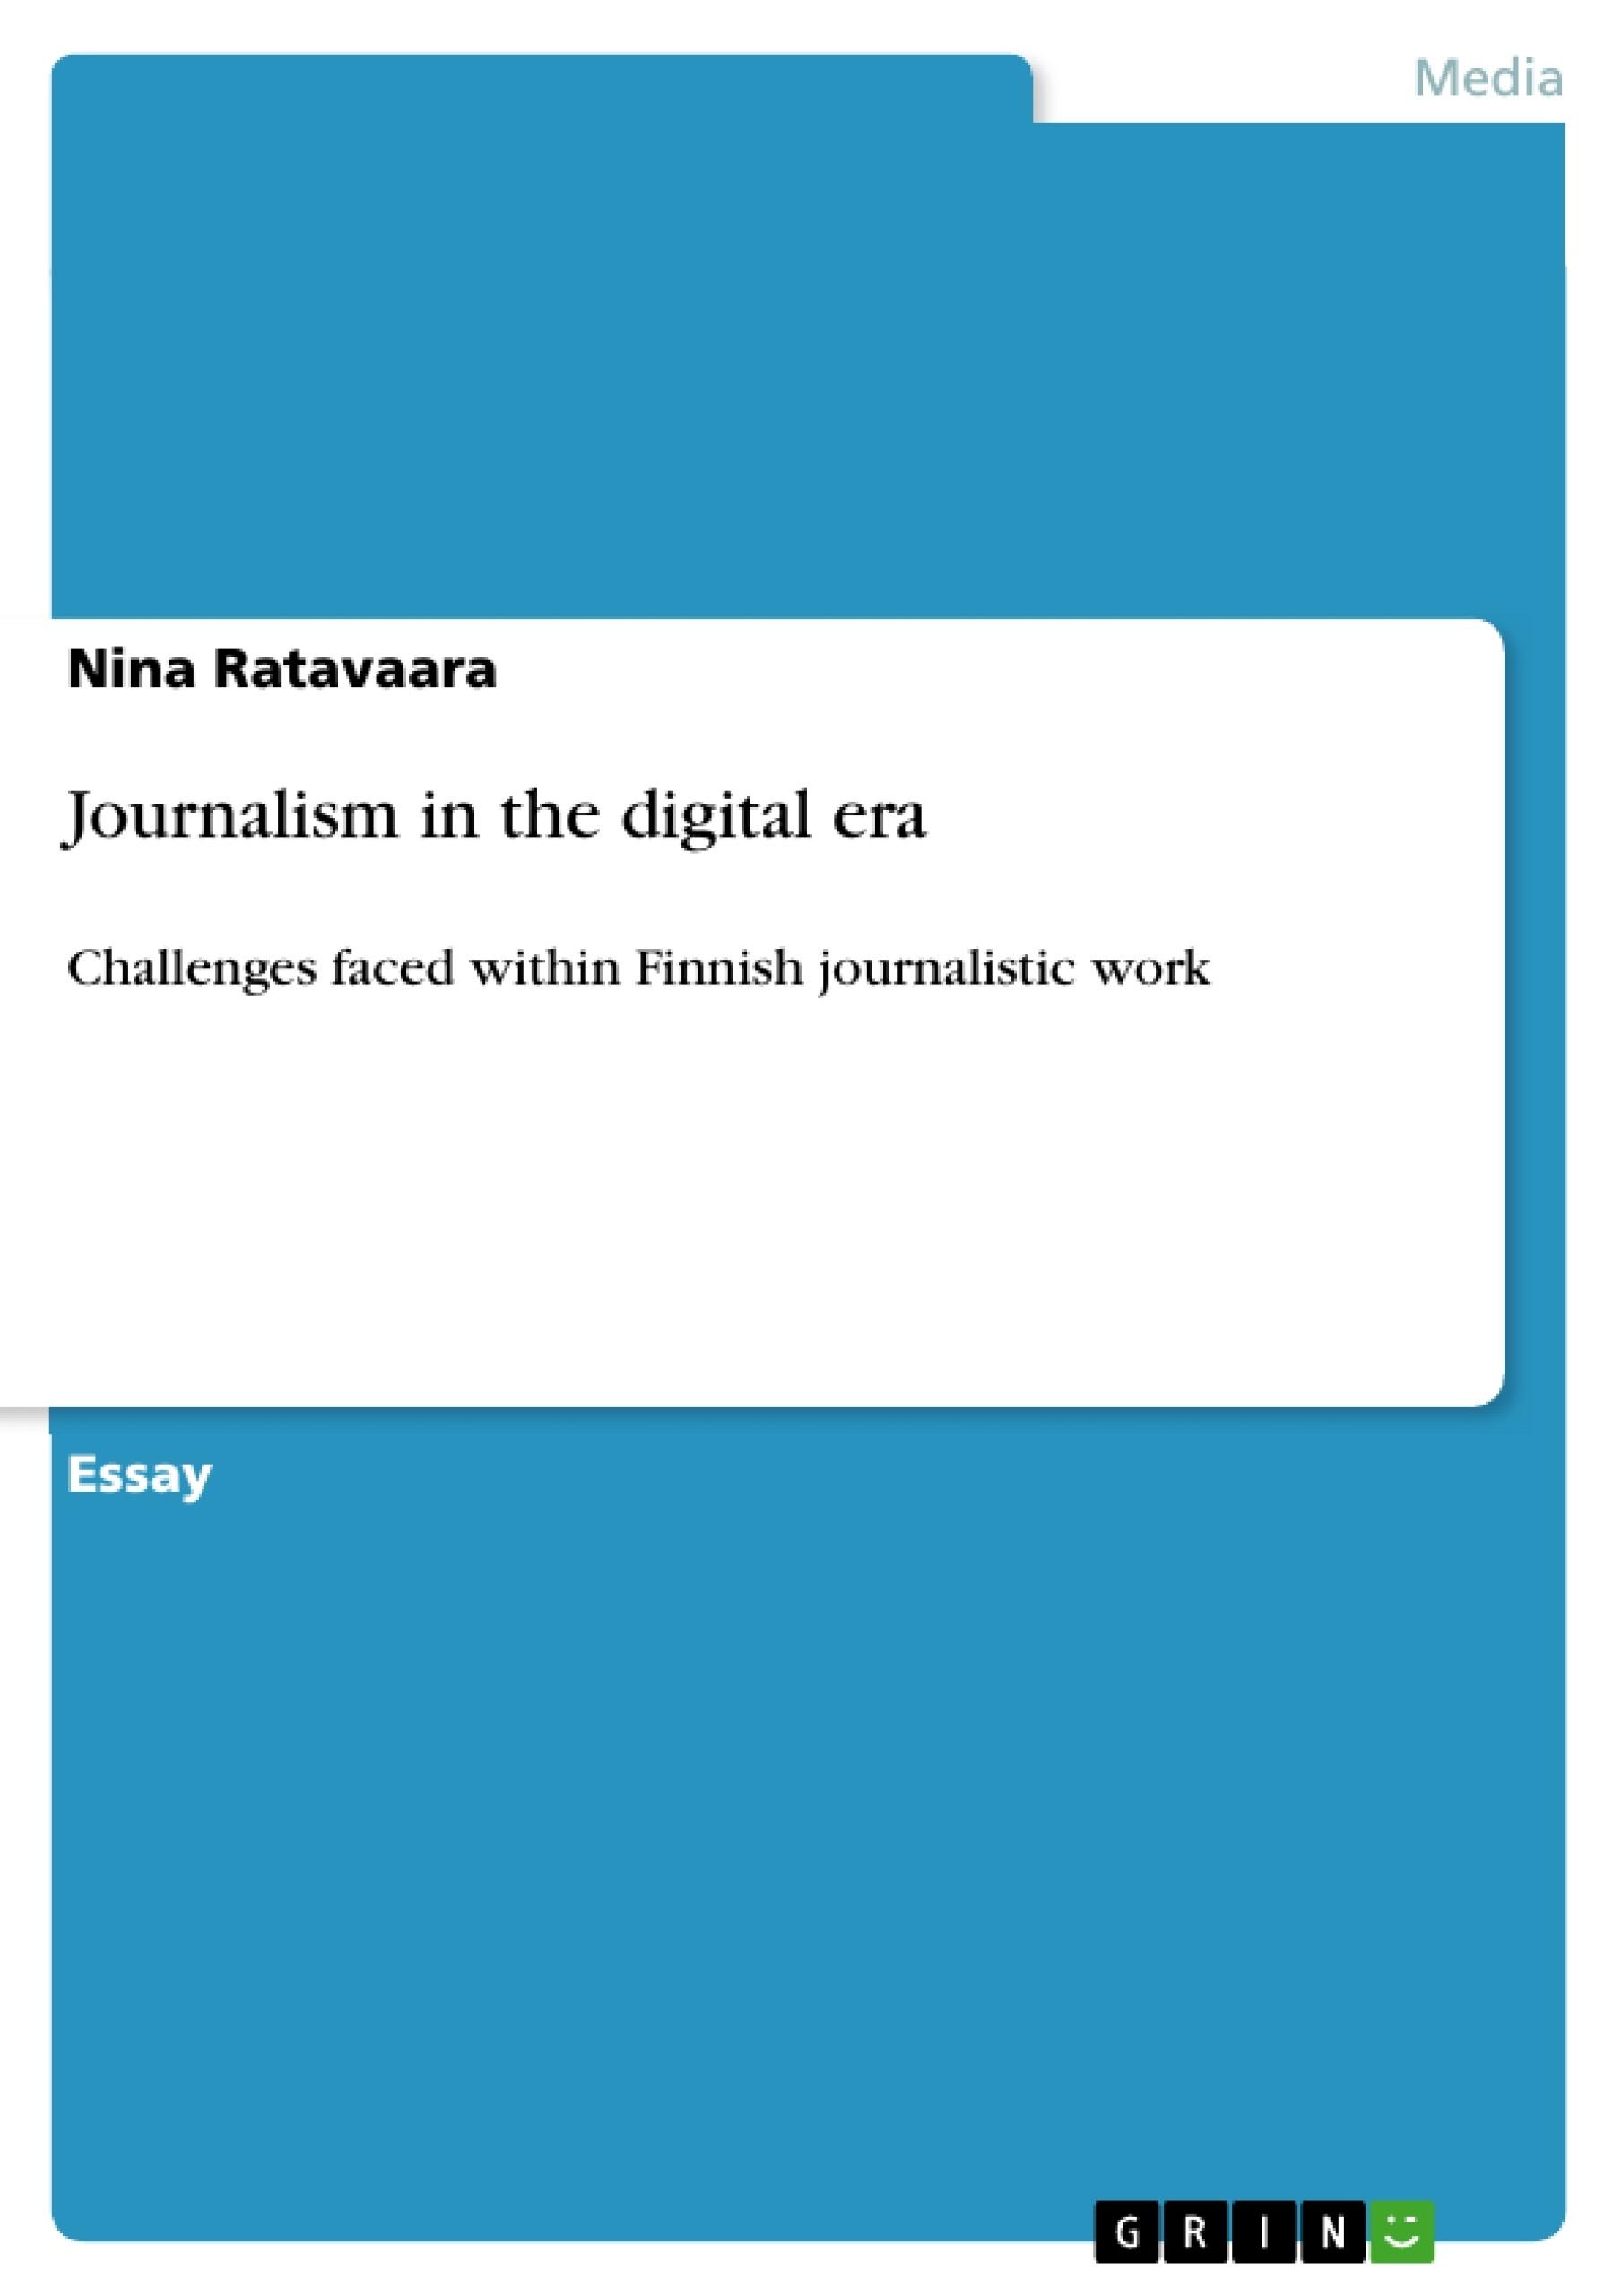 Title: Journalism in the digital era